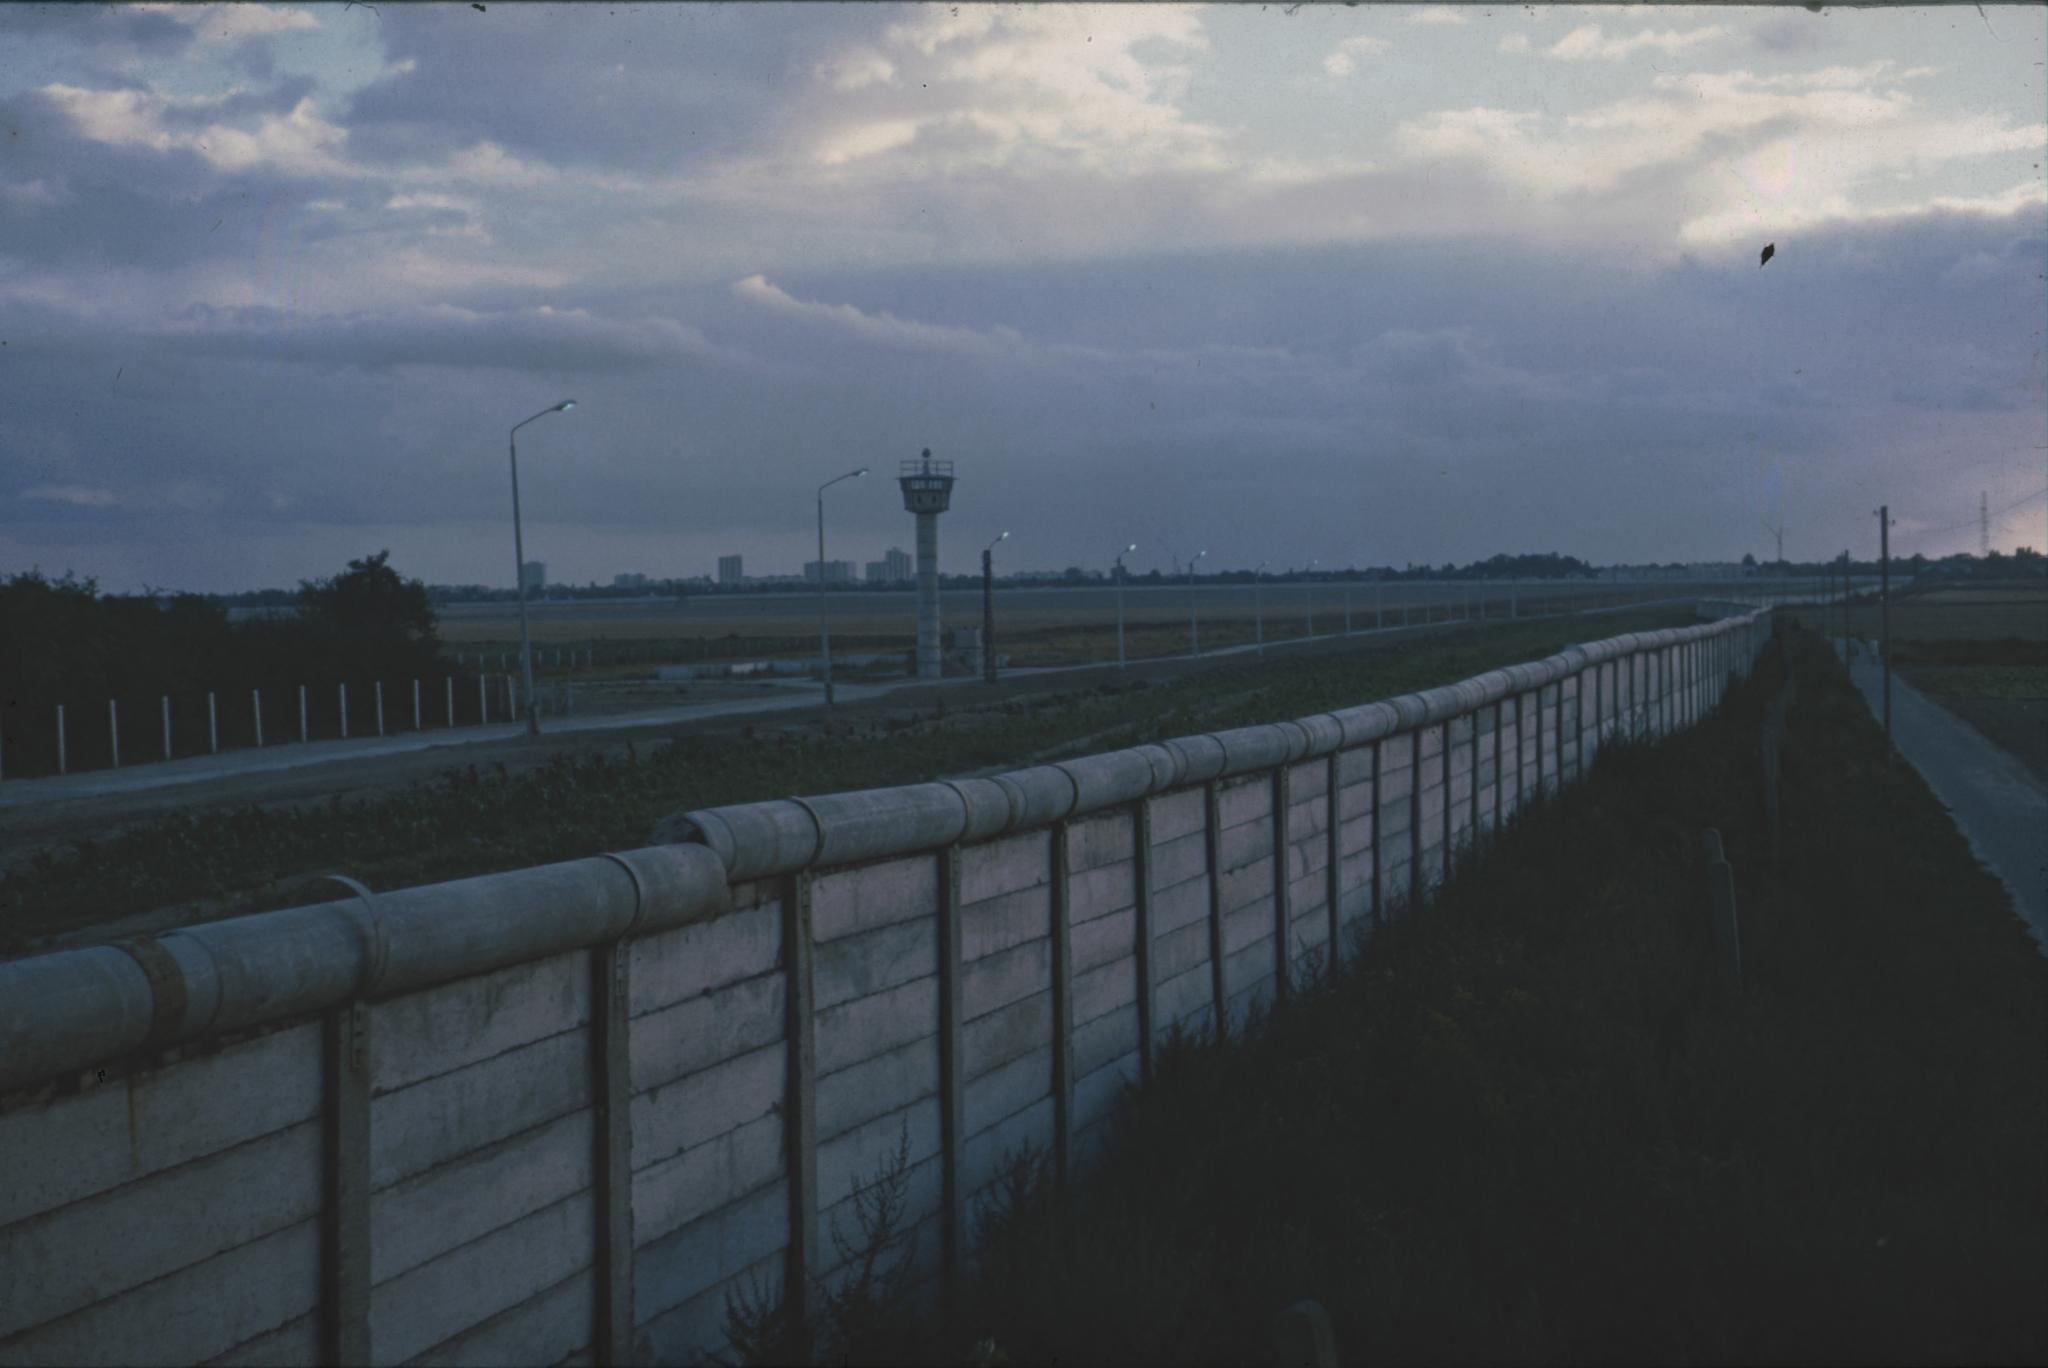 Die Berliner Mauer um 1973 - Berlin Wall - Daniel Rohde-Kage 56